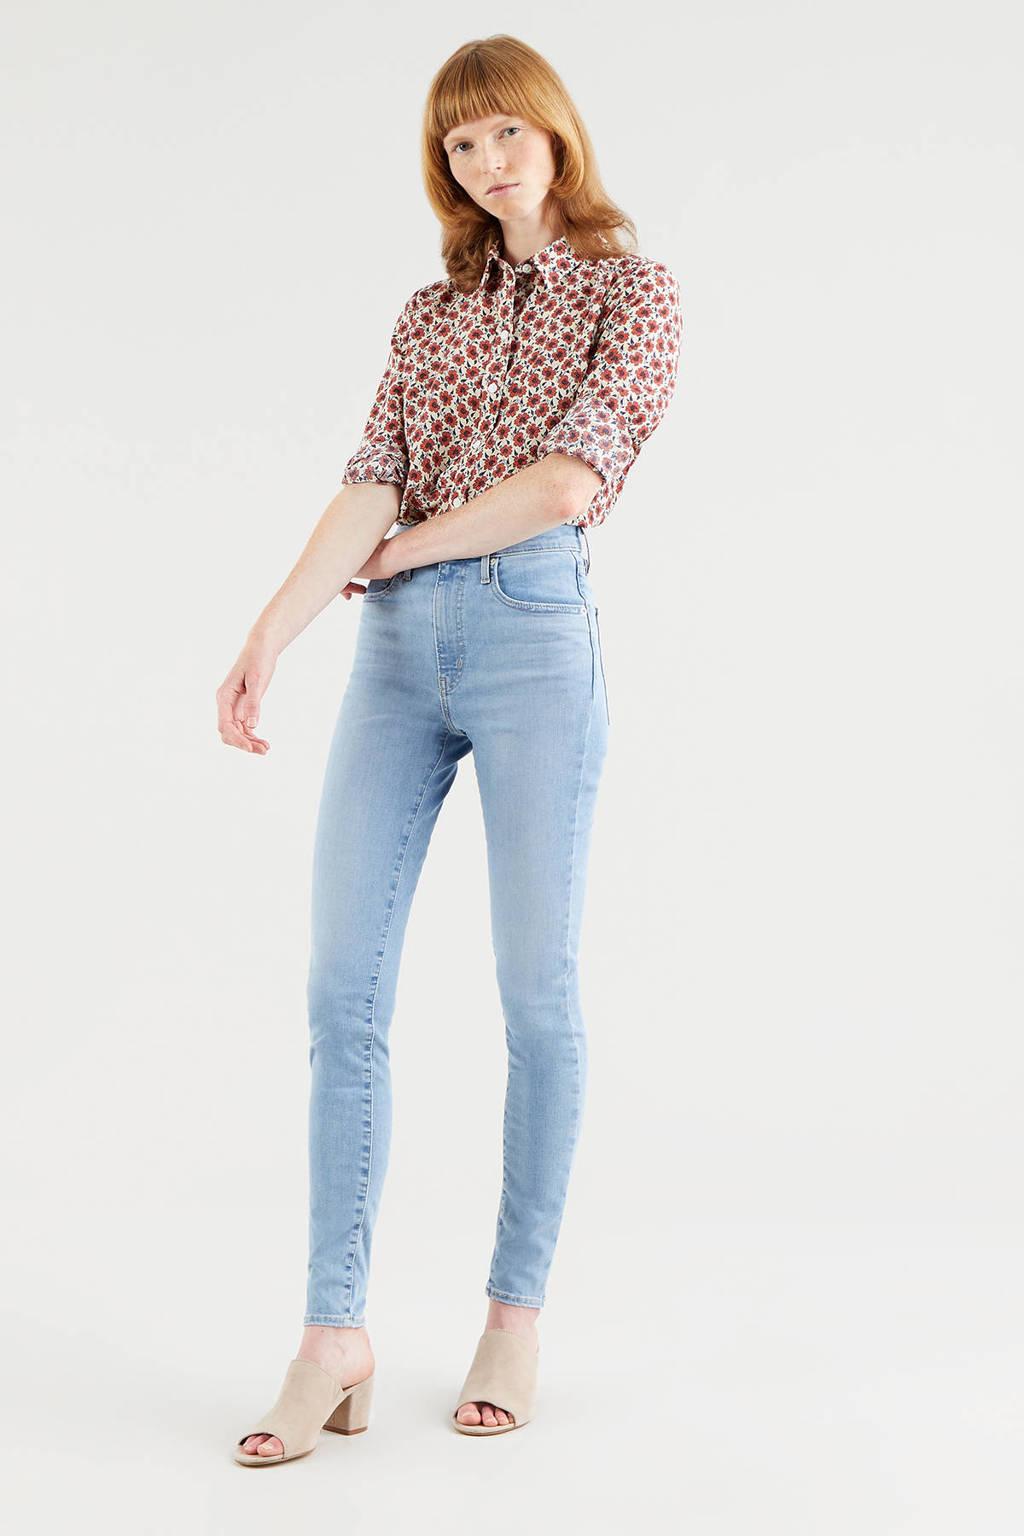 Levi's gebloemde blouse THE CLASSIC SHIRT ecru/rood, Ecru/rood